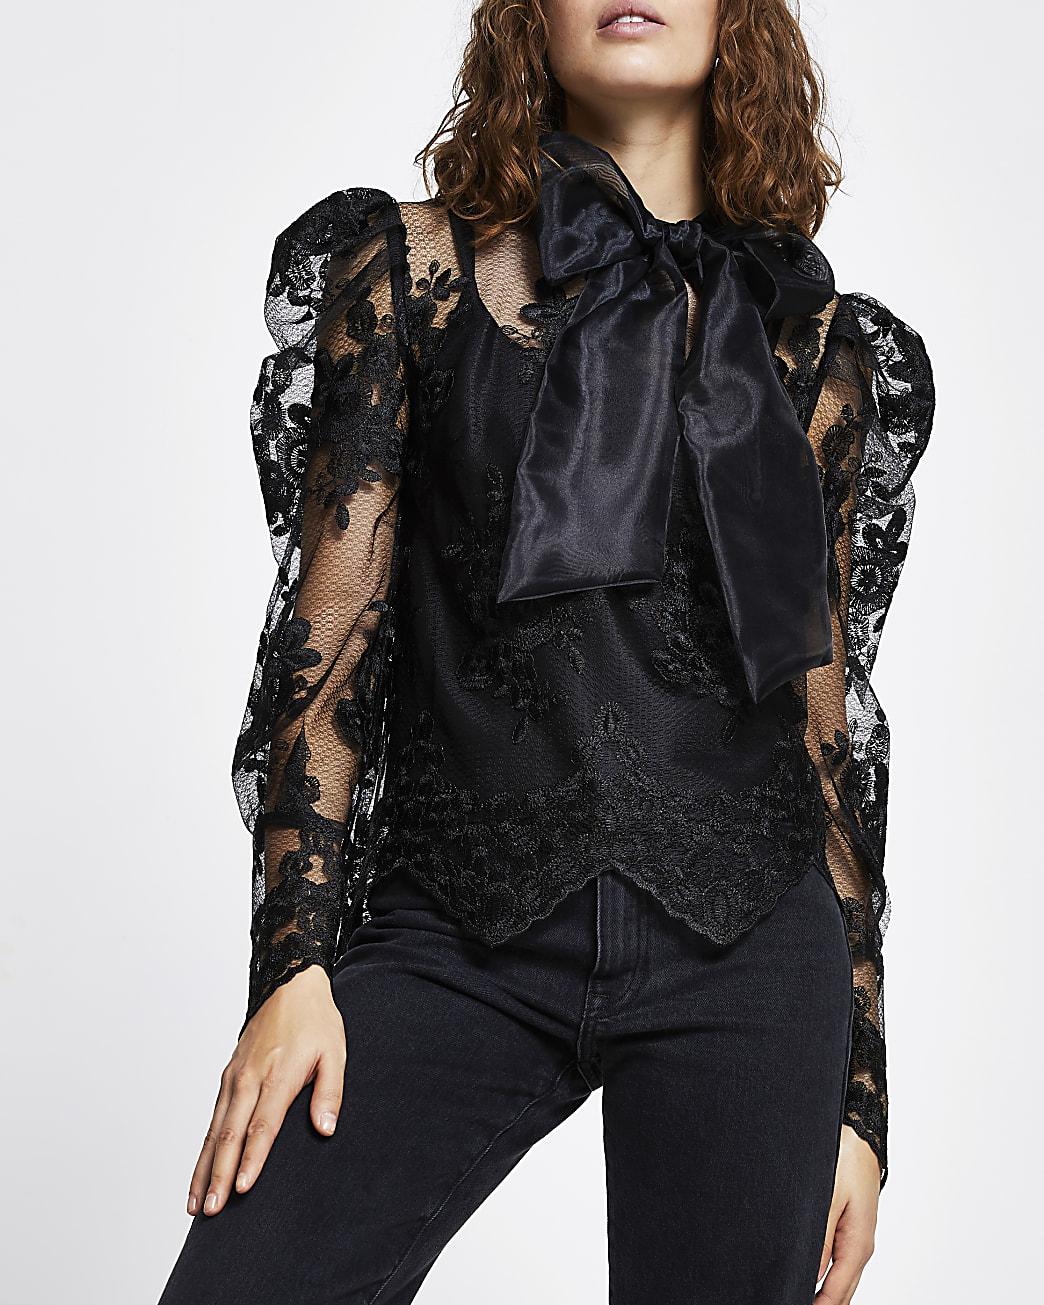 Black long puff sleeve organza lace top